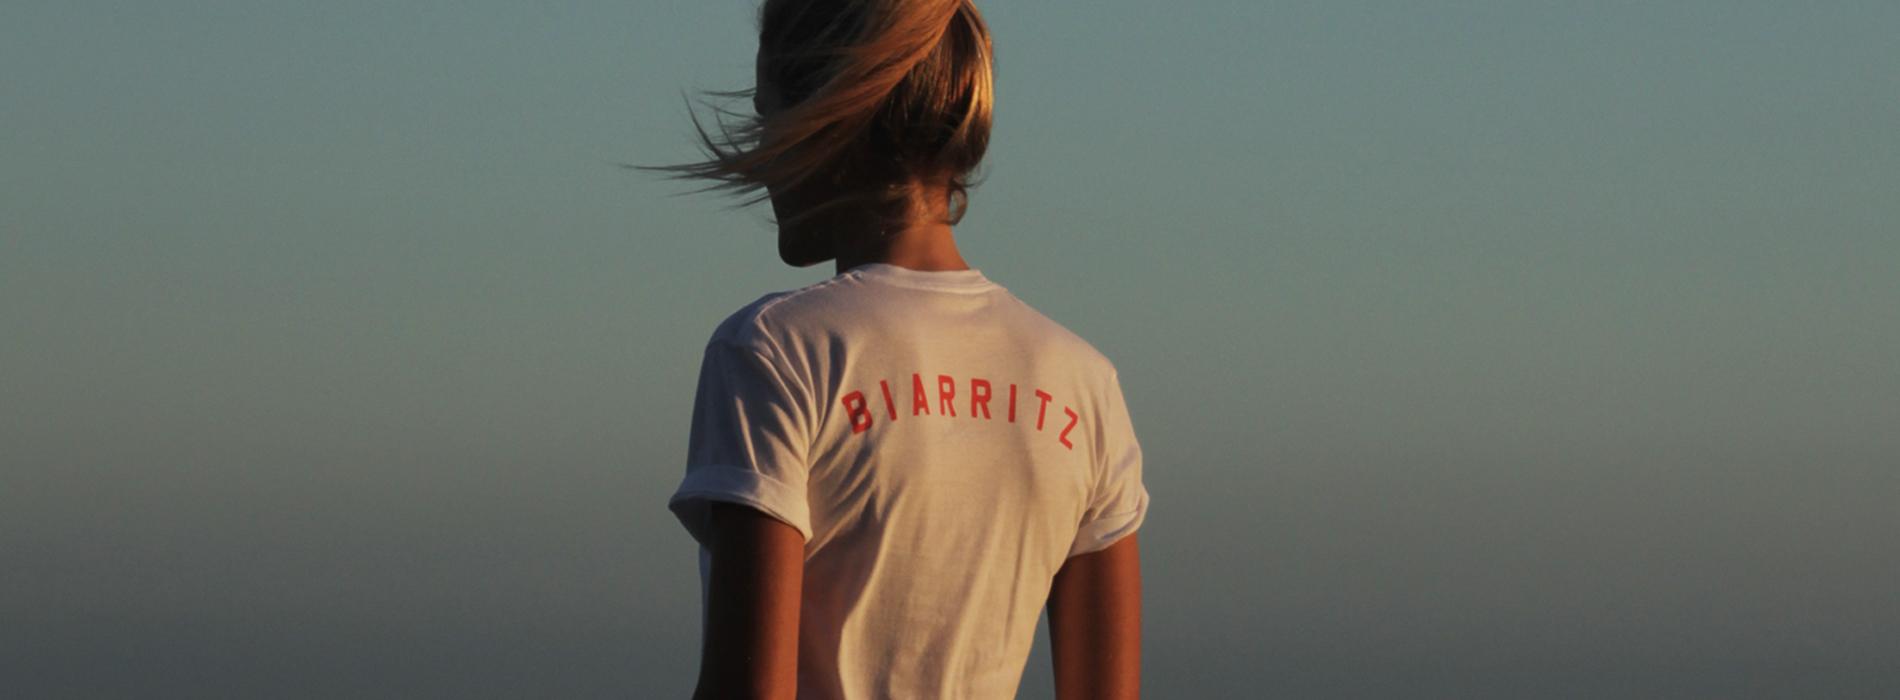 LinkBiarritz